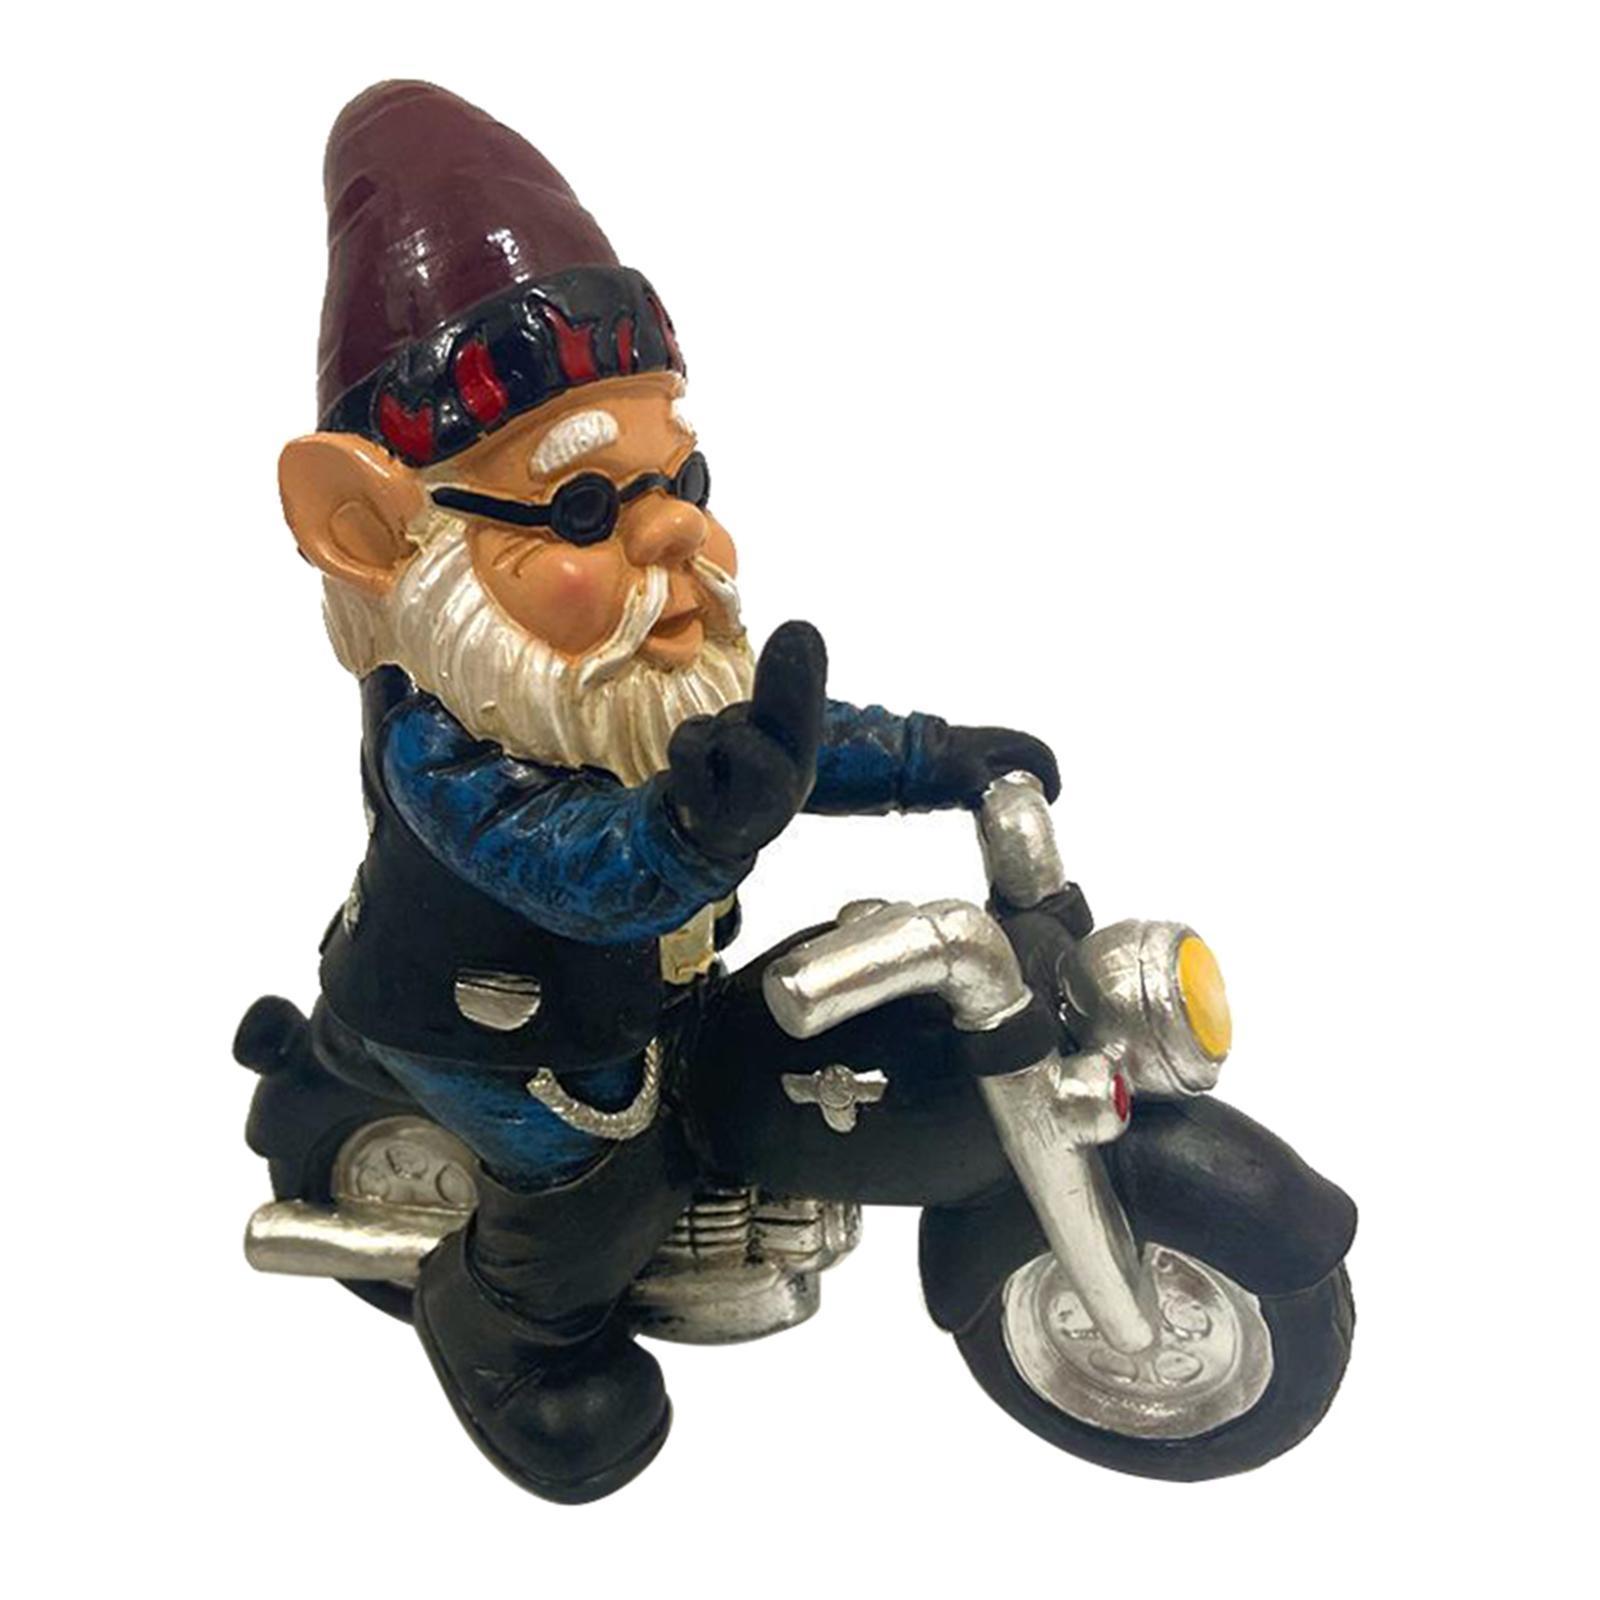 thumbnail 24 - Funny Resin Naughty Garden Gnome Statue Ornaments Outdoor Villa Home Figurines